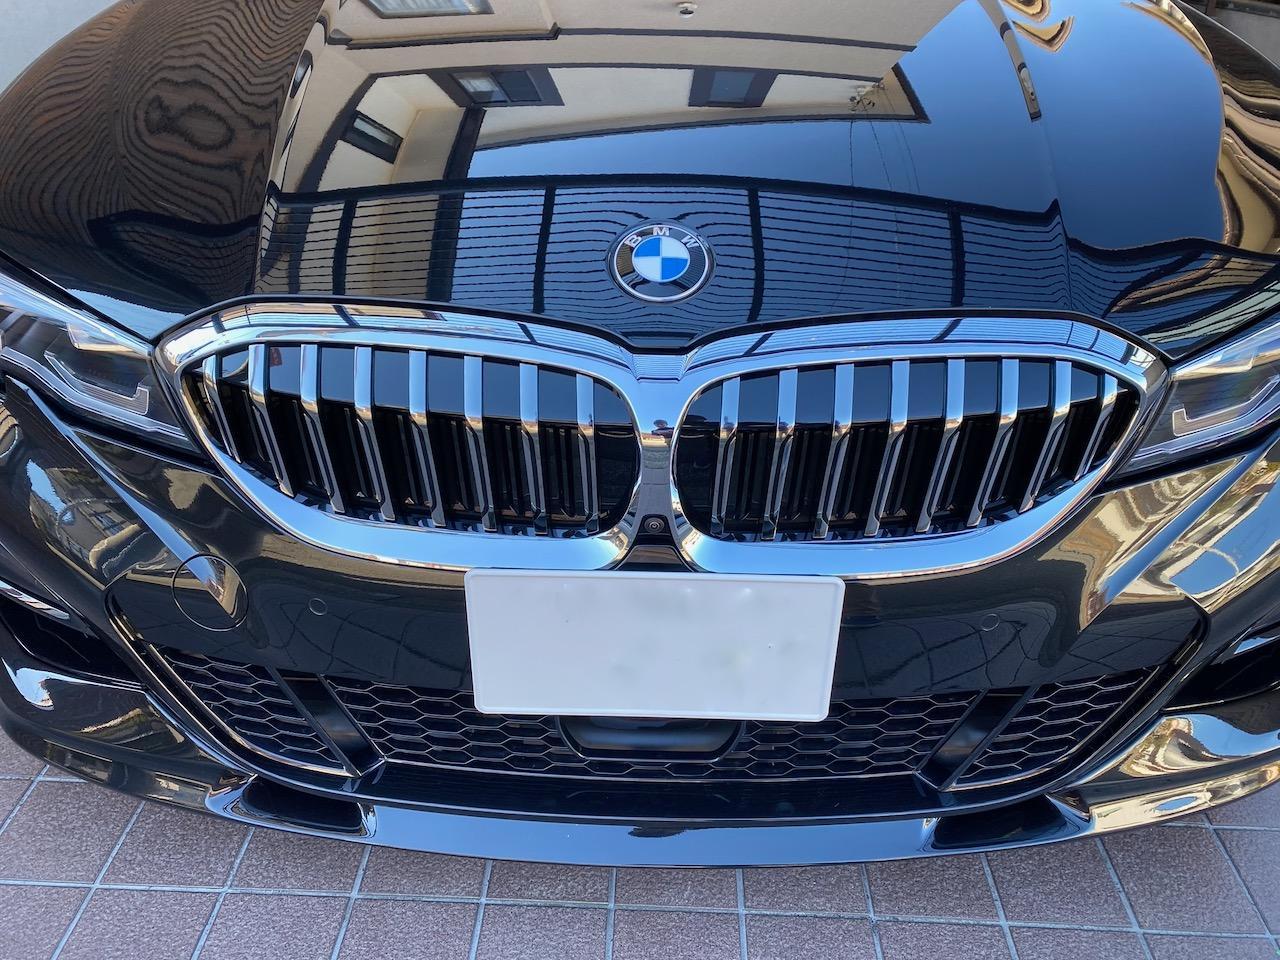 BMW(純正) Luxuryキドニーグリル